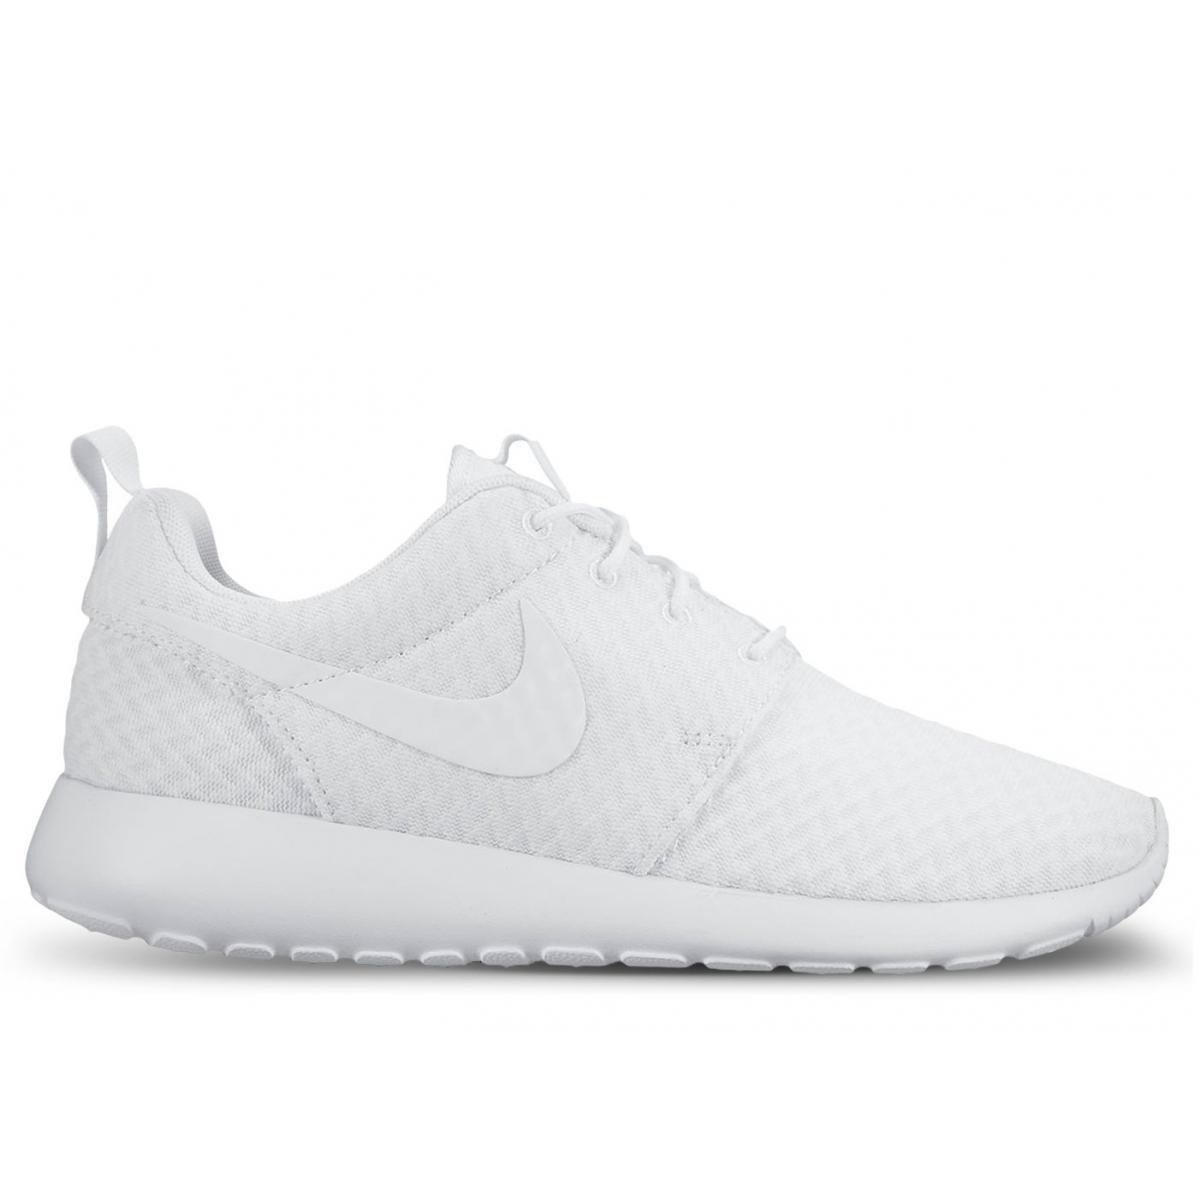 nouveau concept be6e0 87ce5 Nike Roshe Run - 511882-111